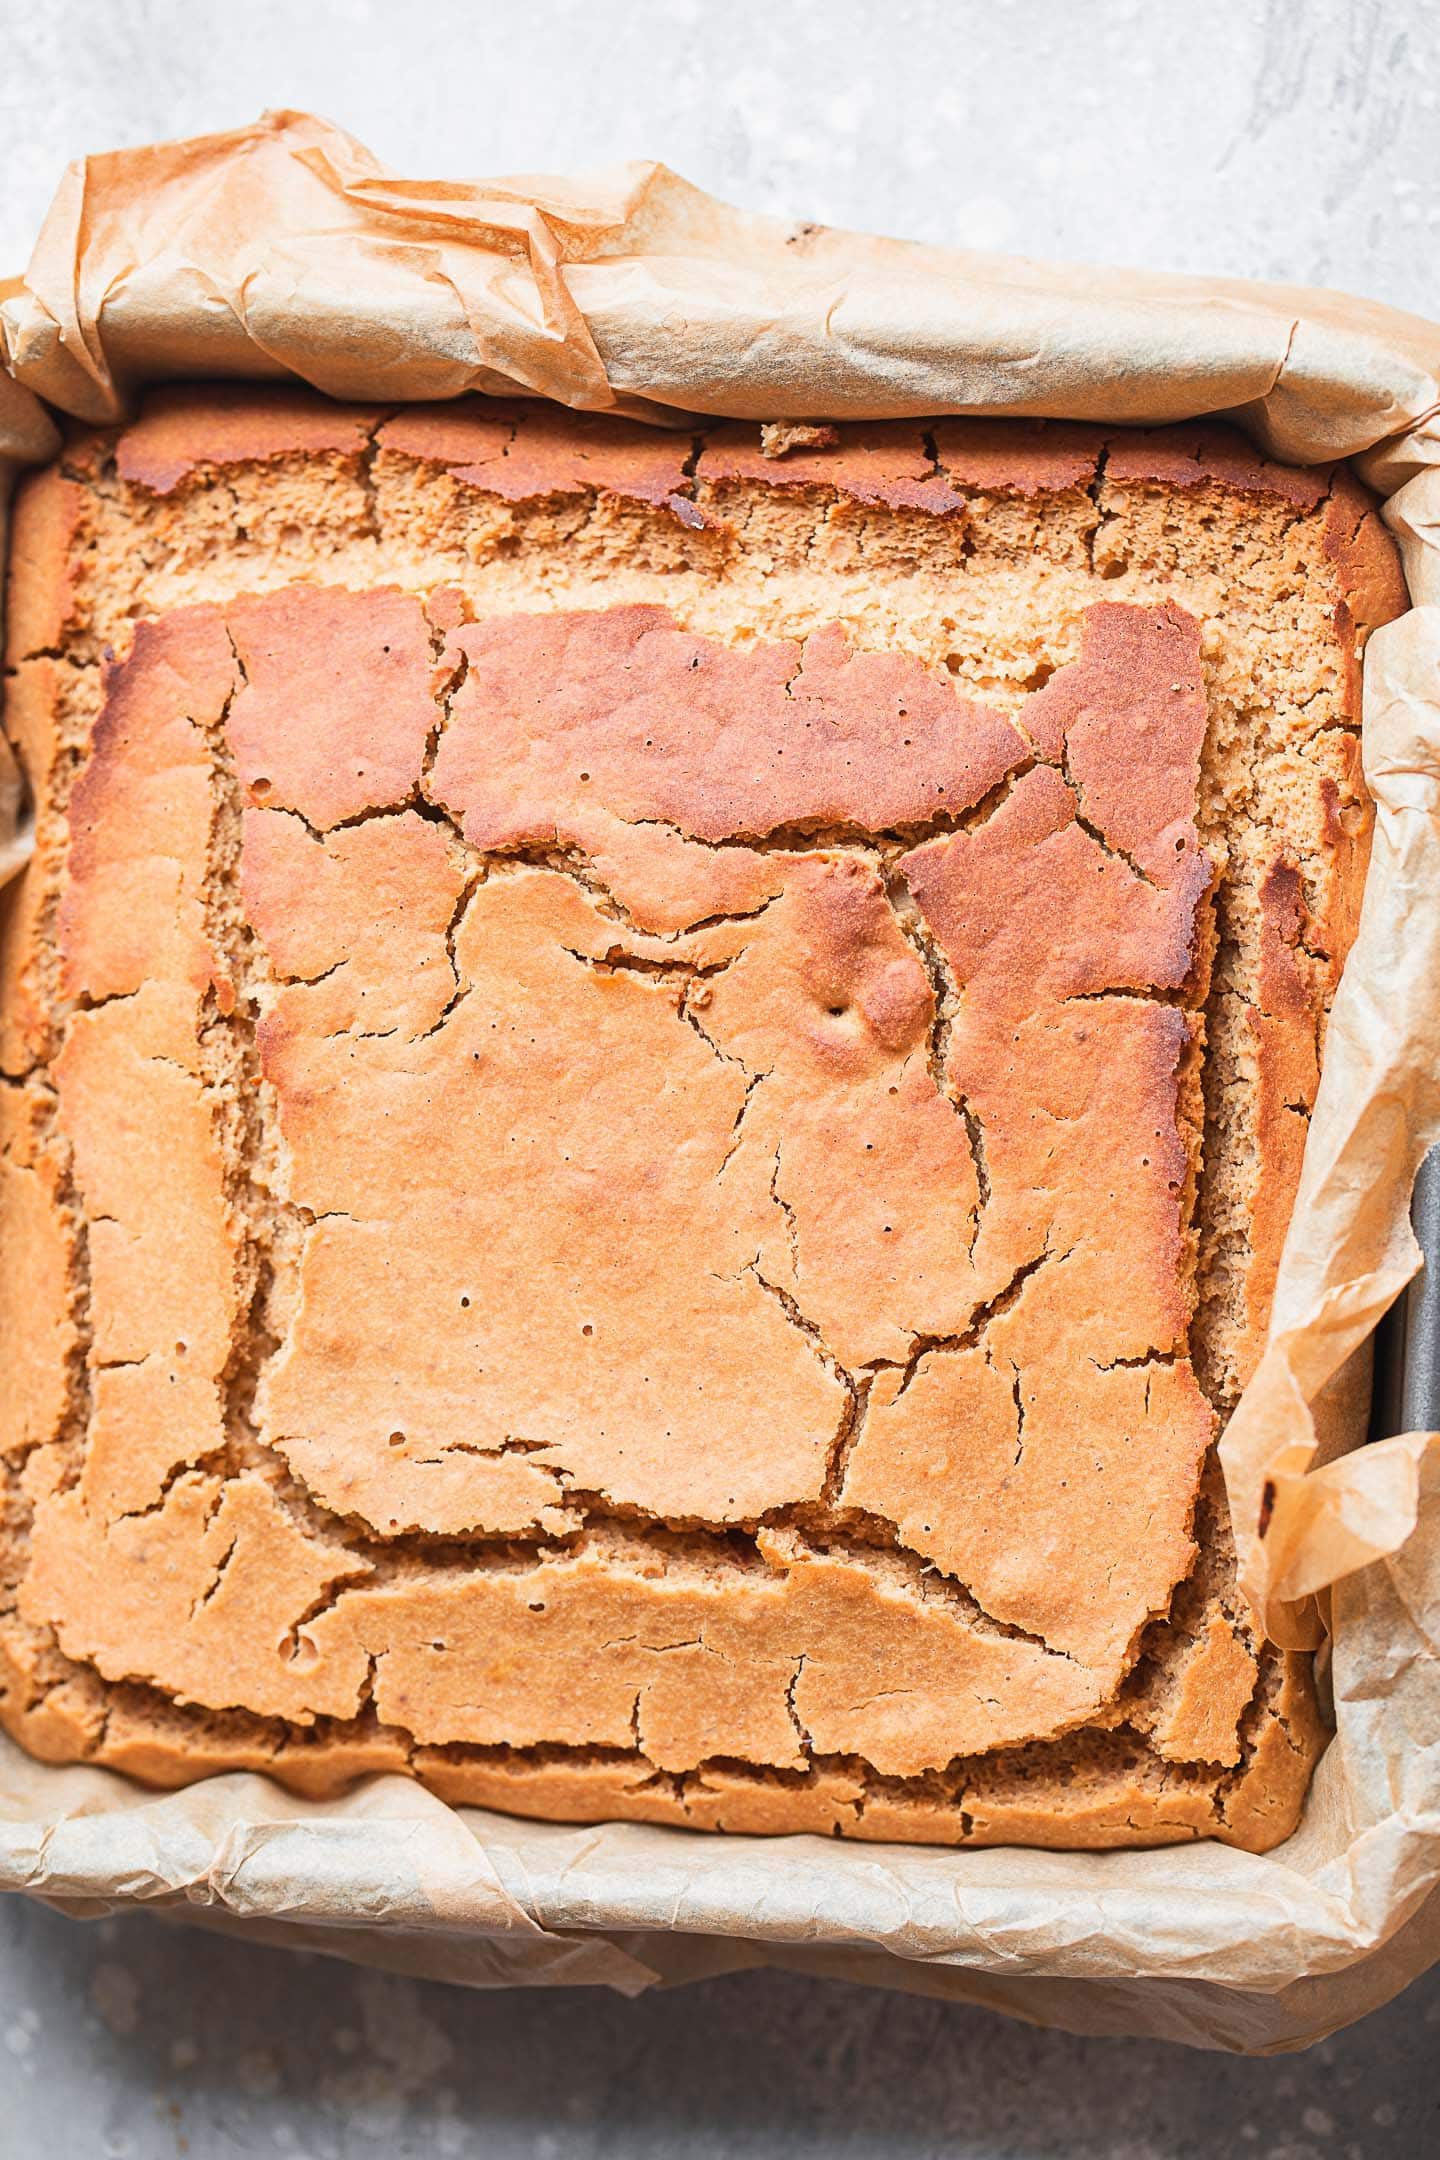 Vegan cake in a square tin